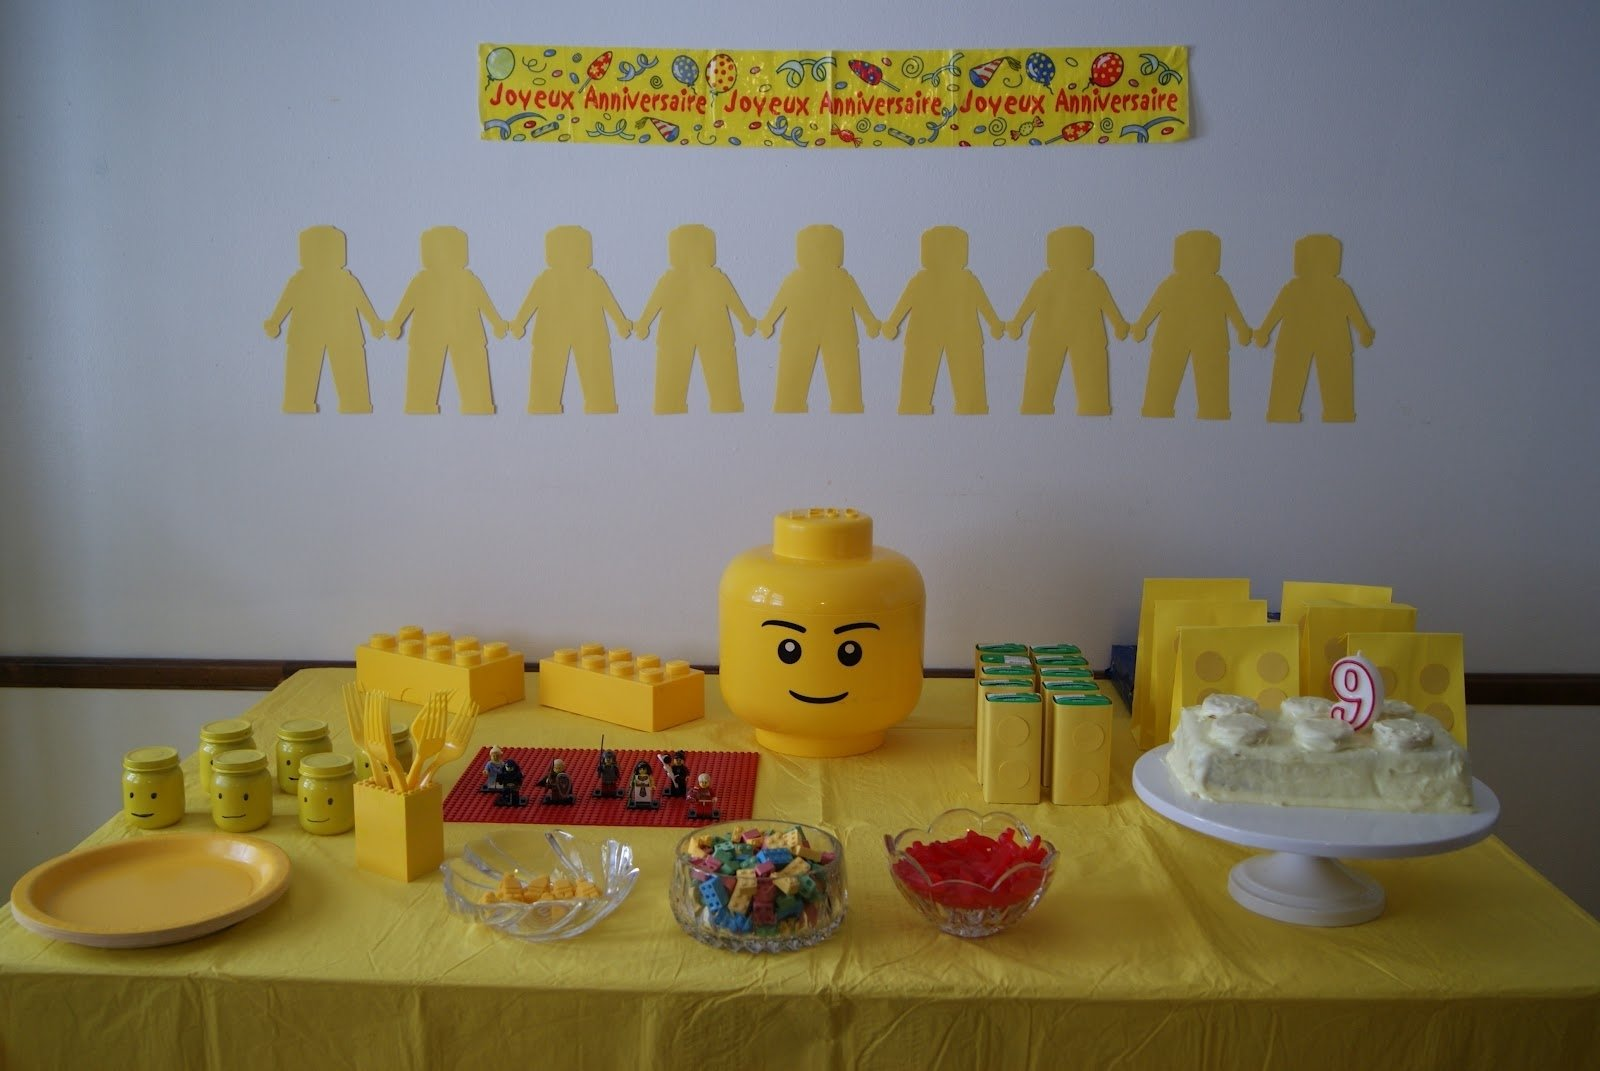 10 Great 8 Year Old Birthday Ideas nest full of eggs yellow lego birthday